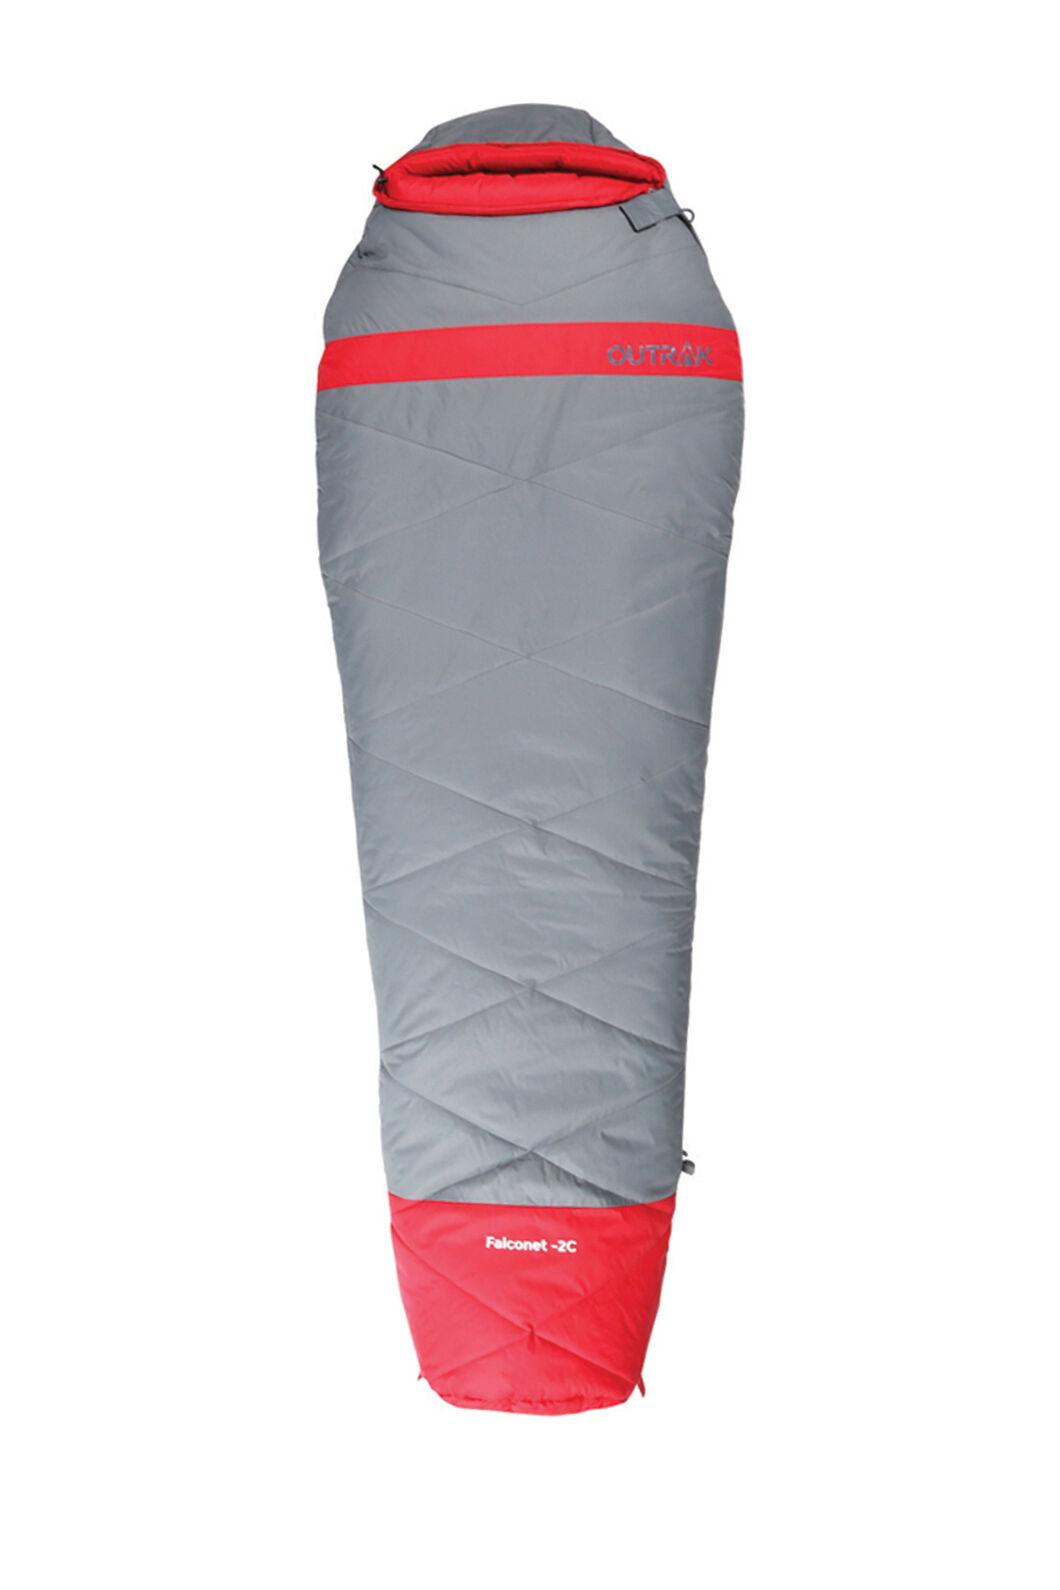 Outrak Falconet Sleeping Bag -2, None, hi-res